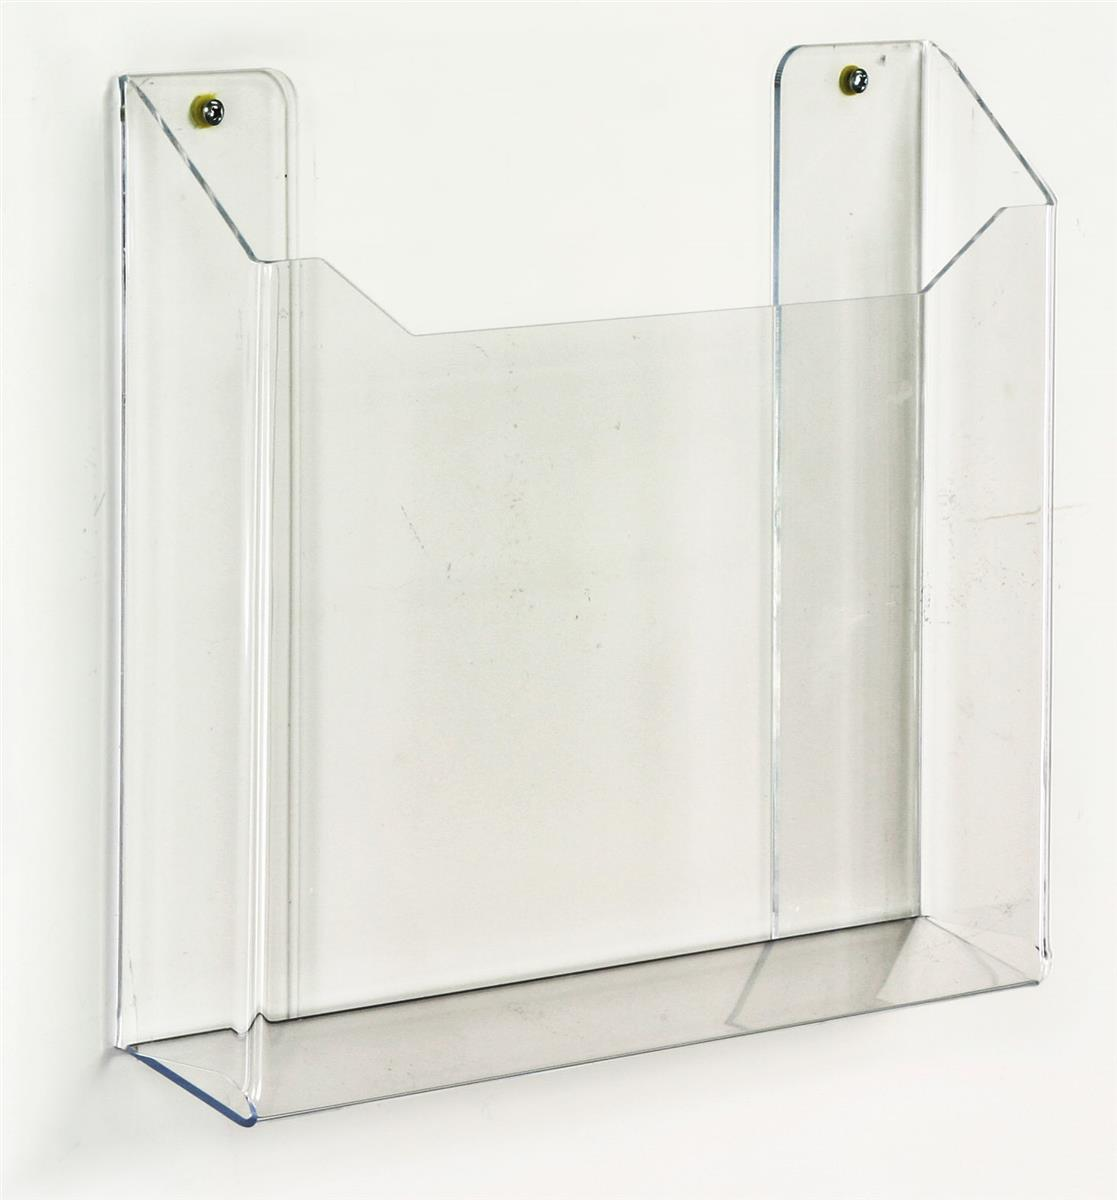 wall newspaper display rack  clear single pocket acrylic holder -